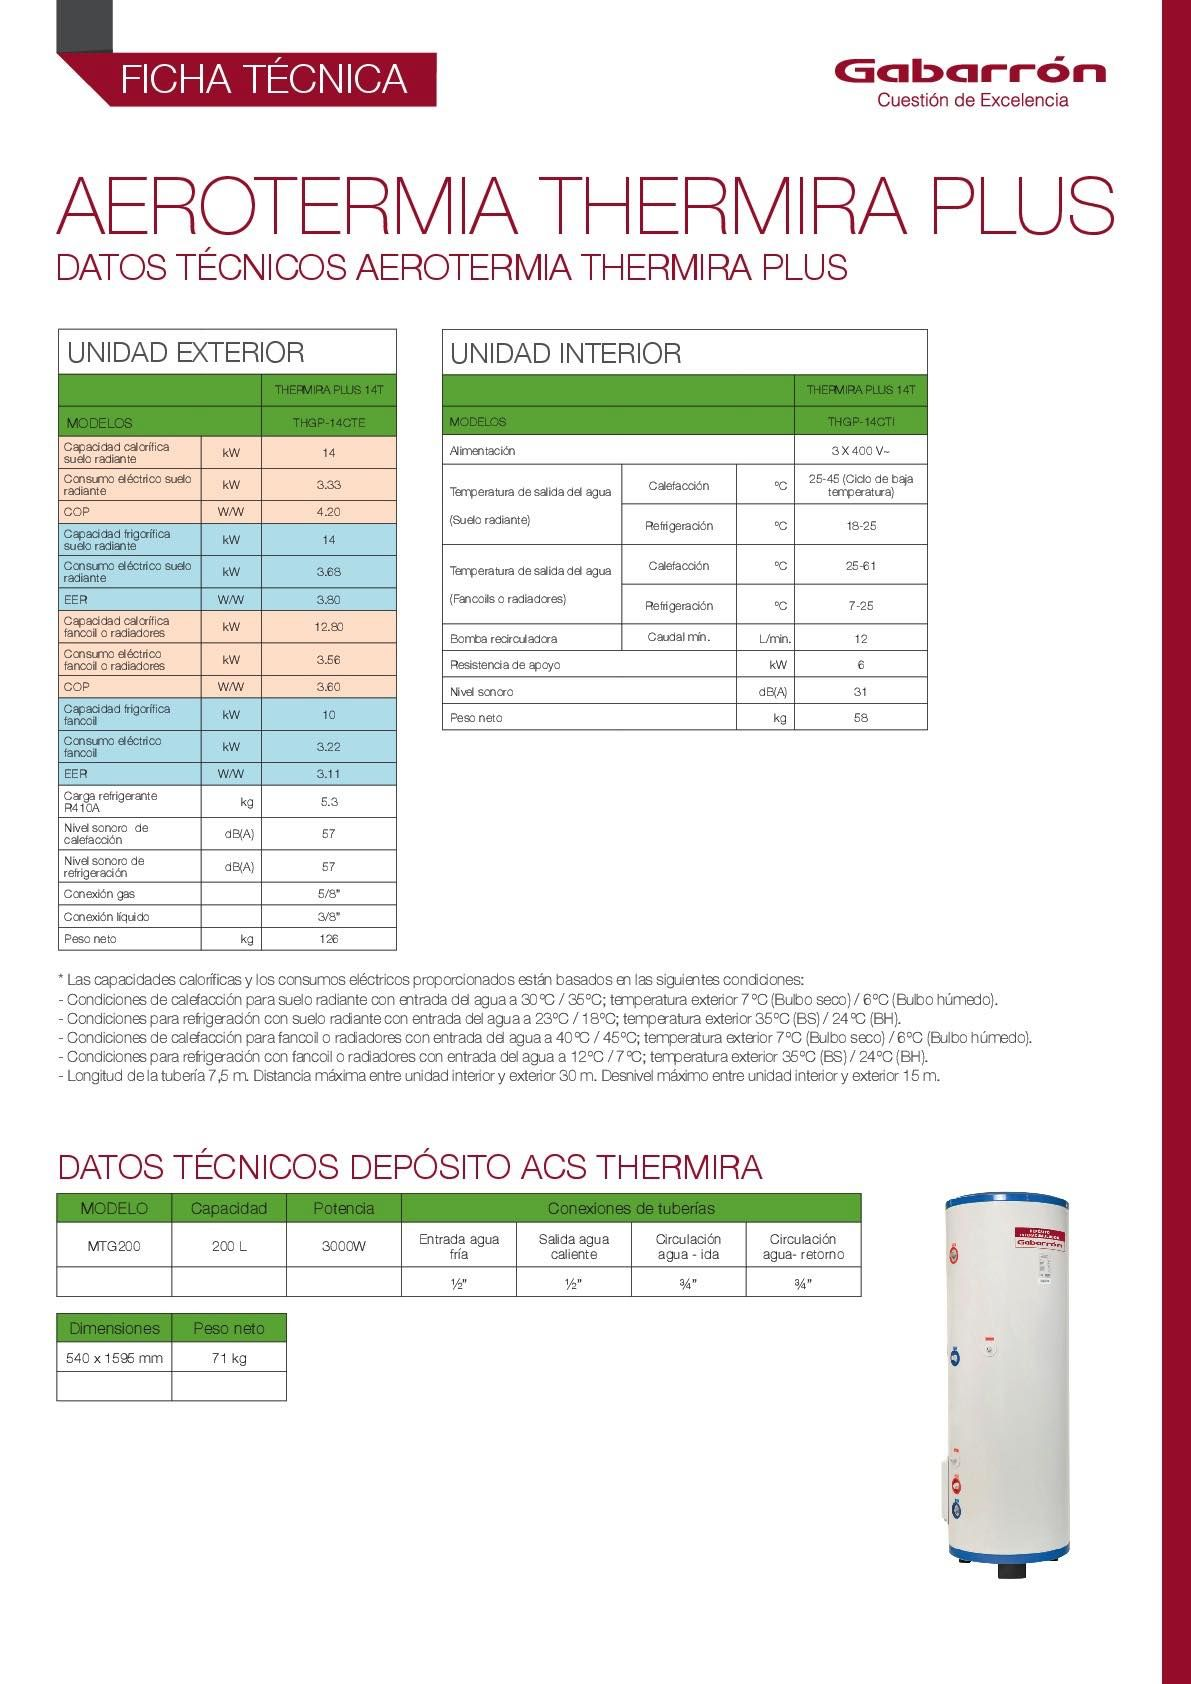 Ficha Técnica Aerotermia Thermira Plus Gabarrón 14T Trifásica